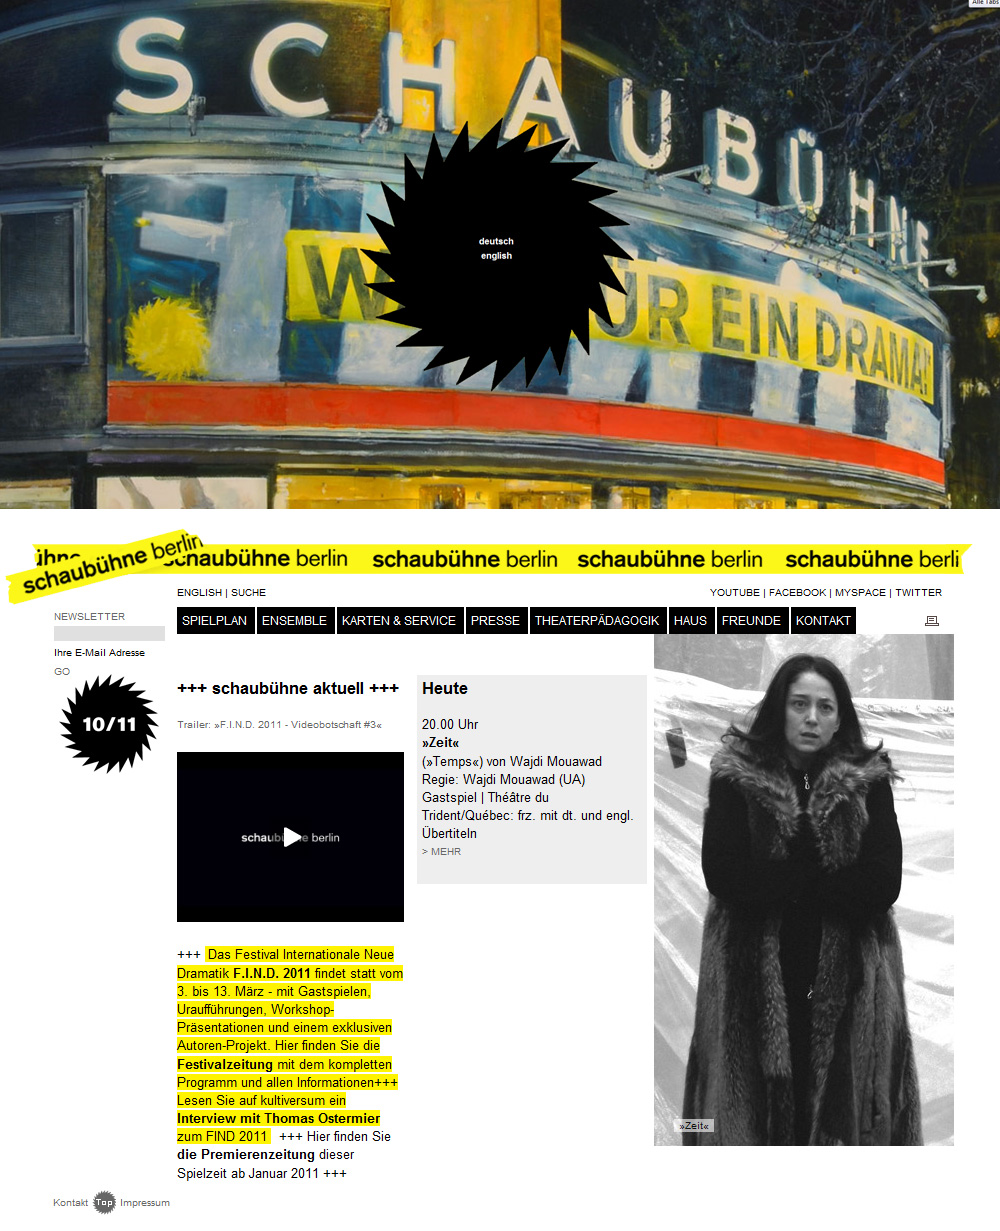 Die Website als Crime Scene